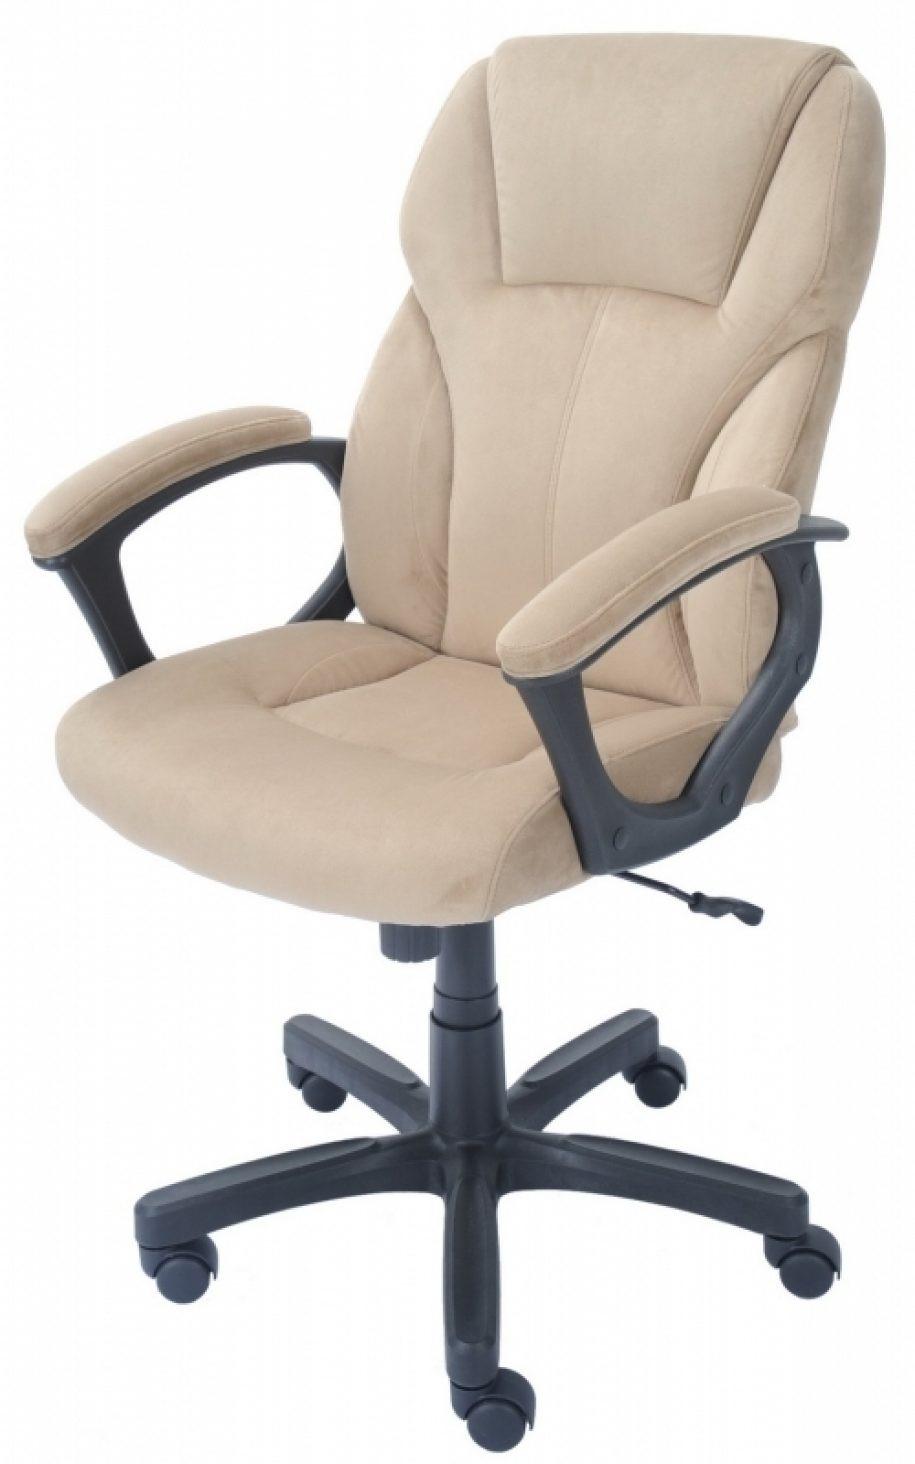 Best ideas about Cheap Desk Chair . Save or Pin fice Chairs Cheap richfielduniversity Now.